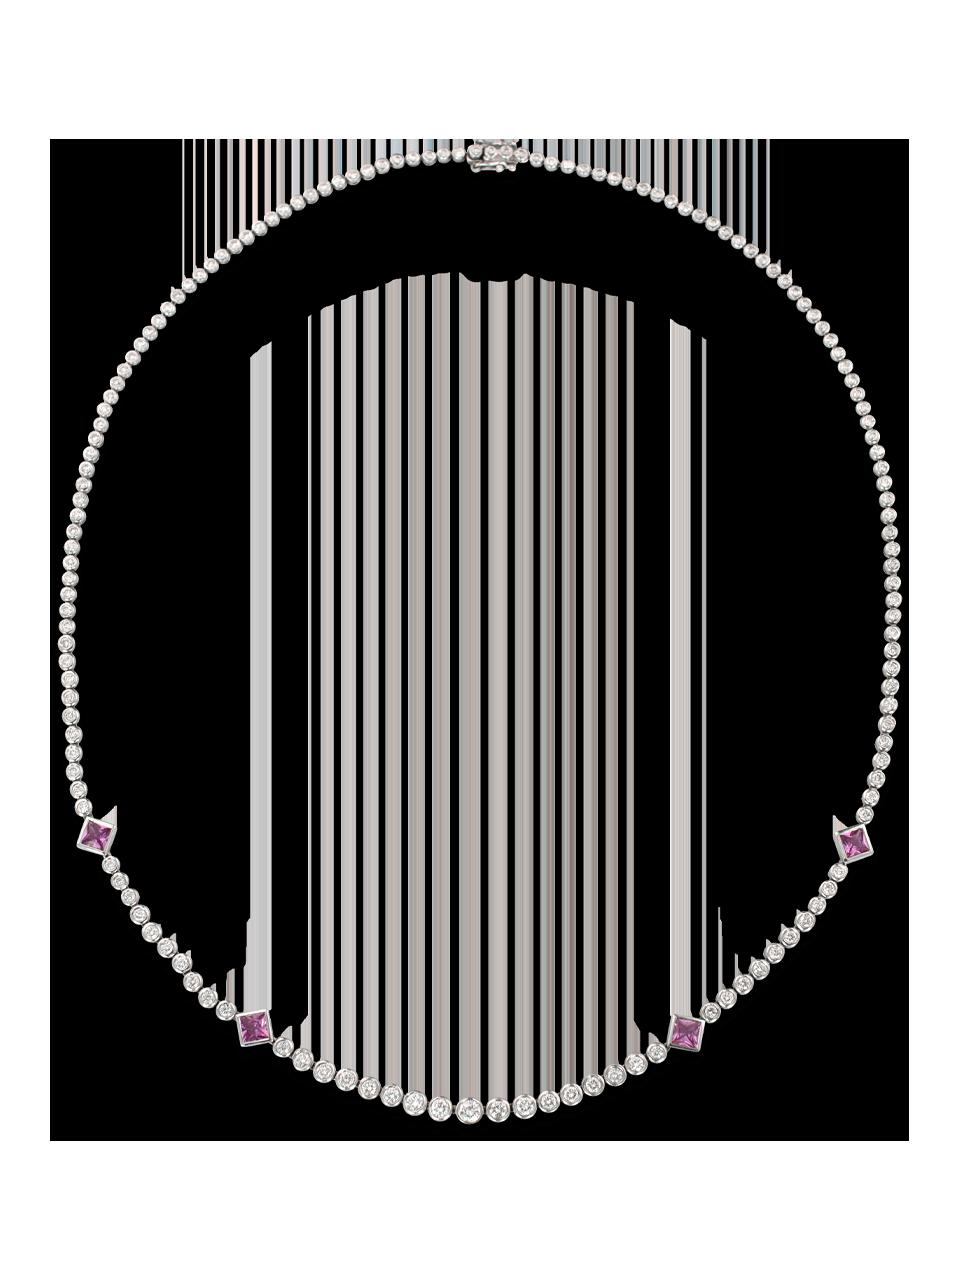 White Diamond & Pink Sapphire Necklace-1